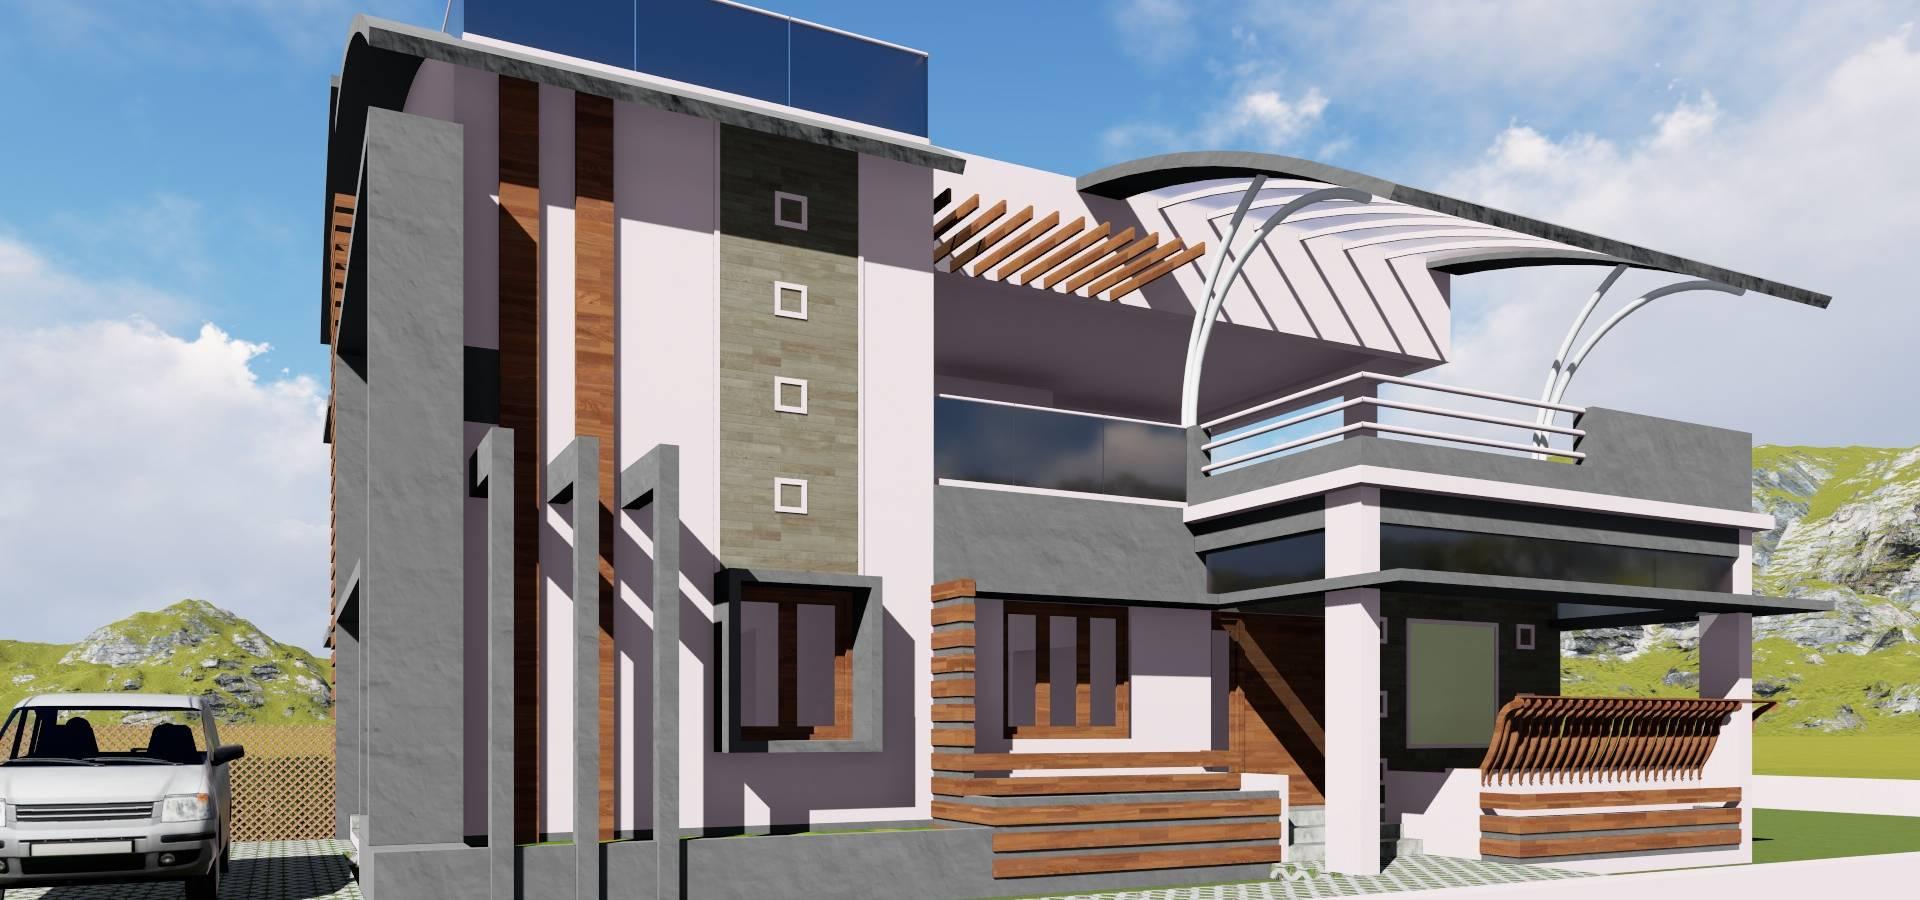 Le Vince Architecture studio